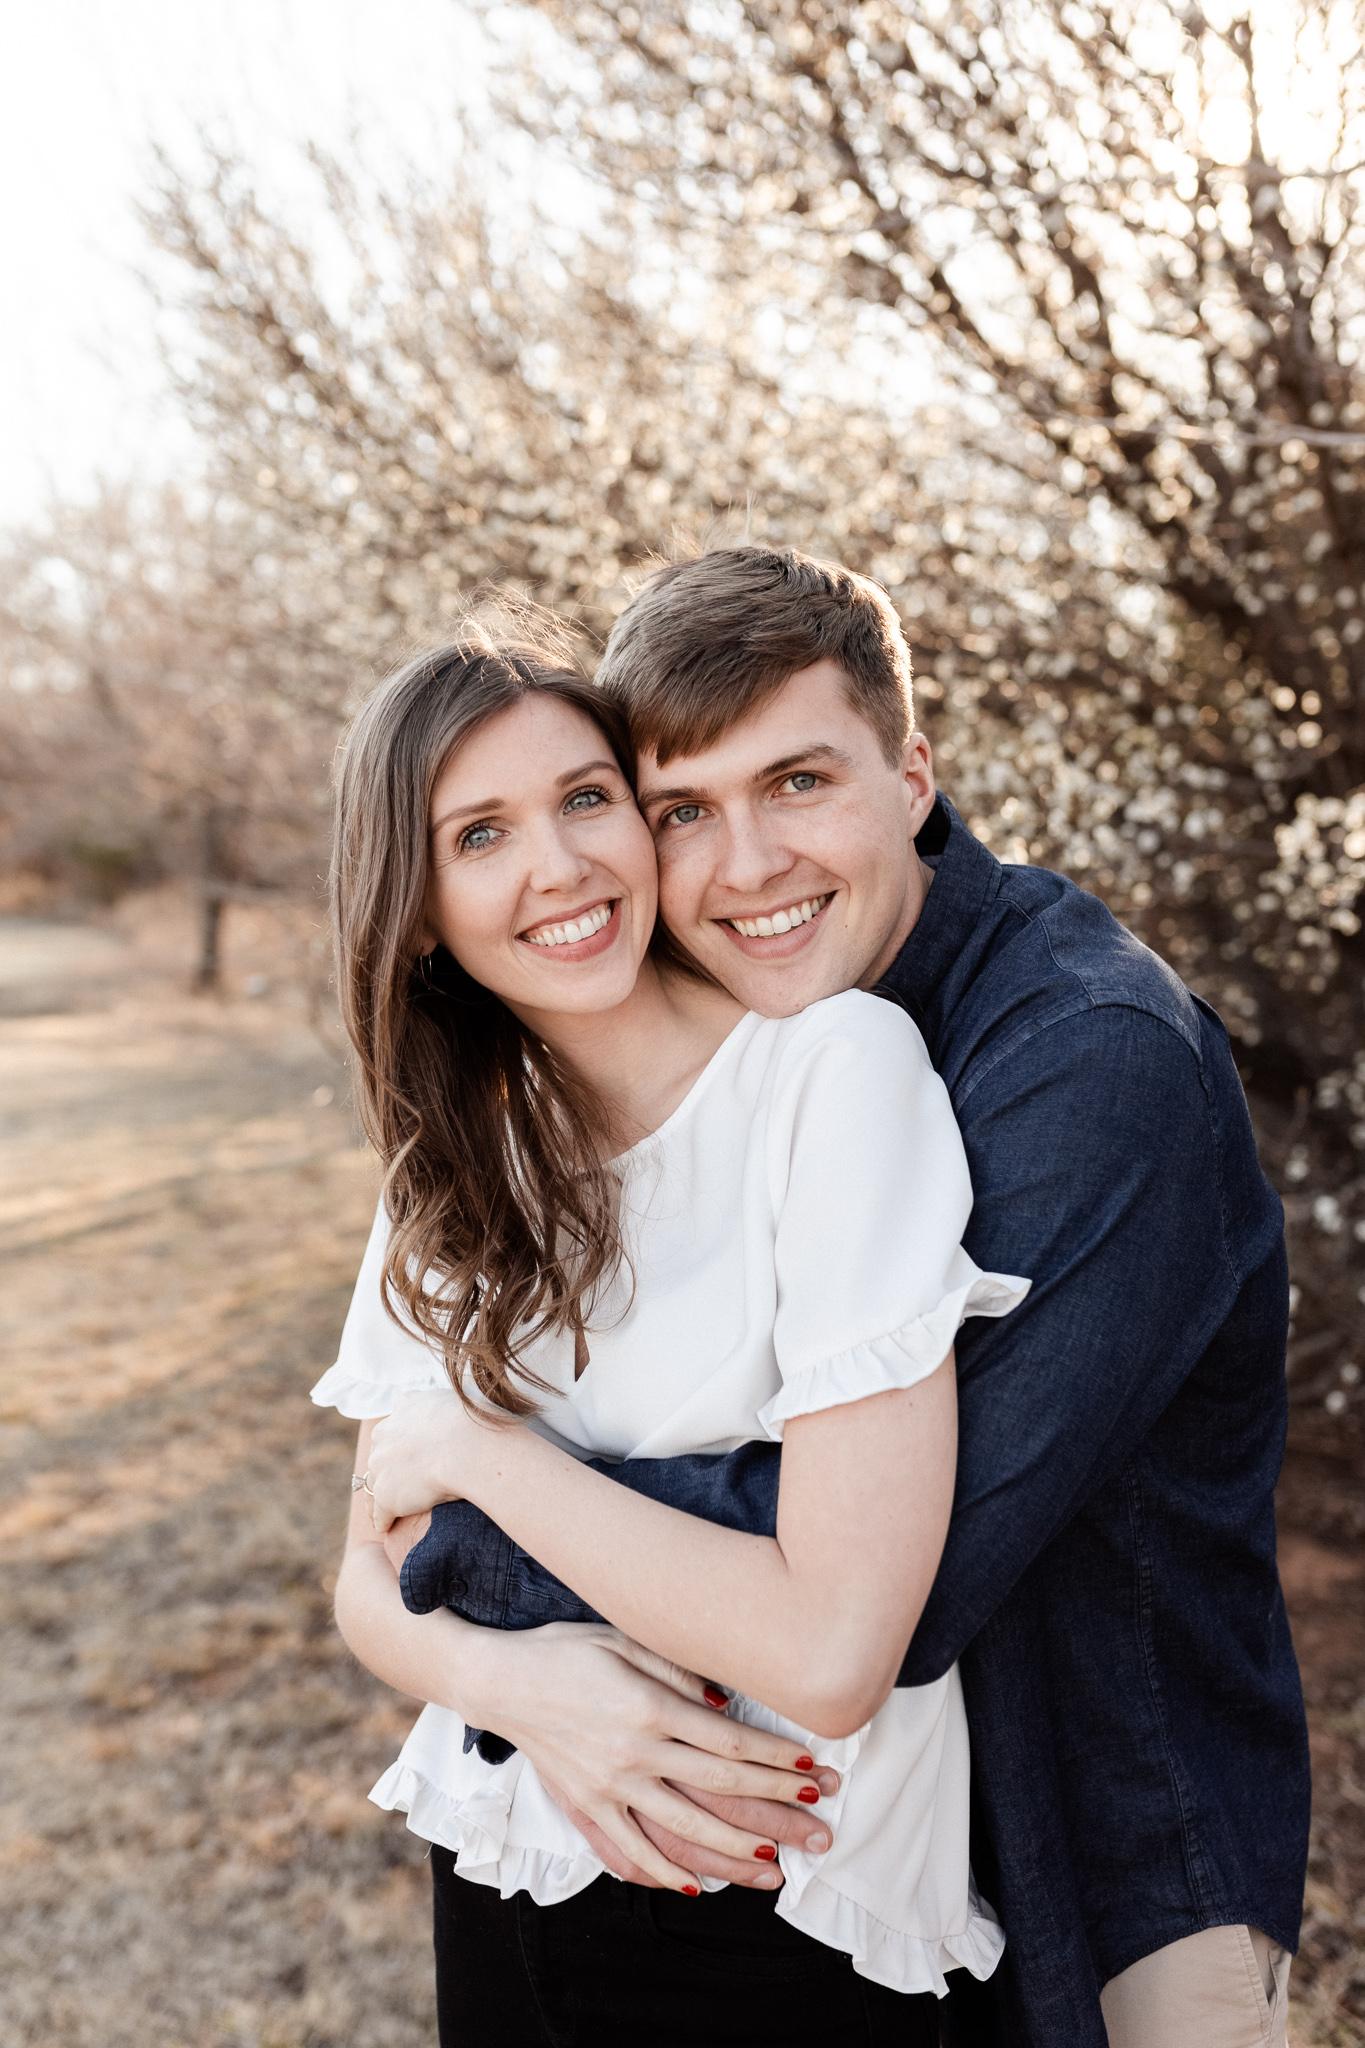 Browne | Timeless Downtown Engagements | Oklahoma Wedding Photographer-5.jpg